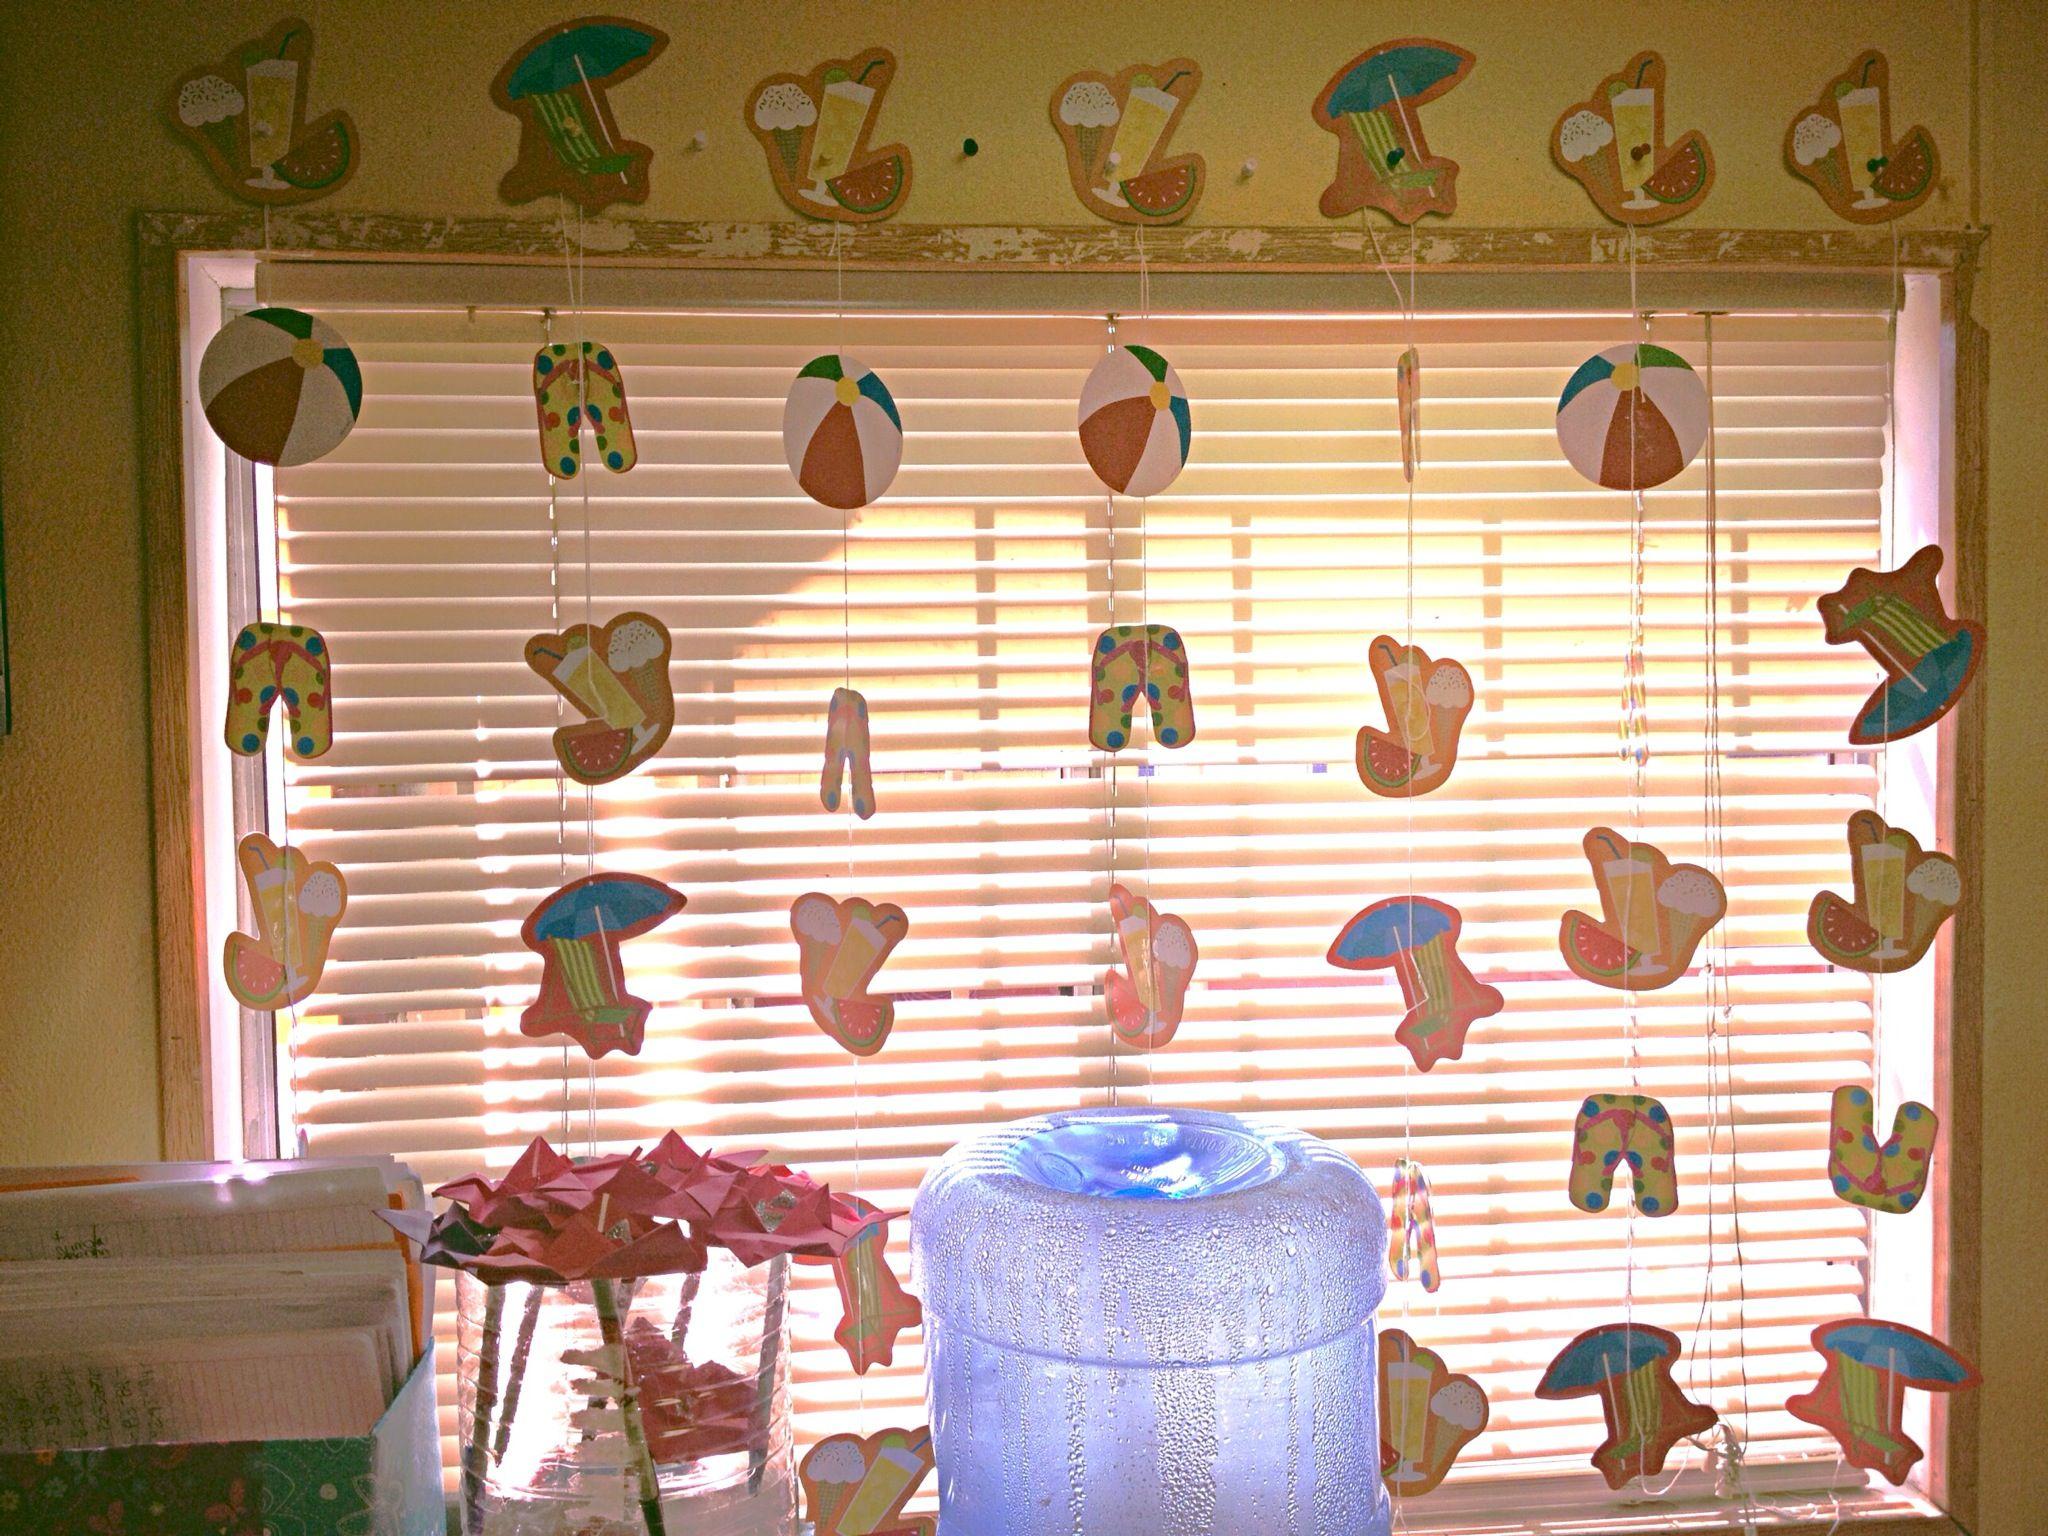 Classroom window decoration -  Summer Window School Classroom Decoration